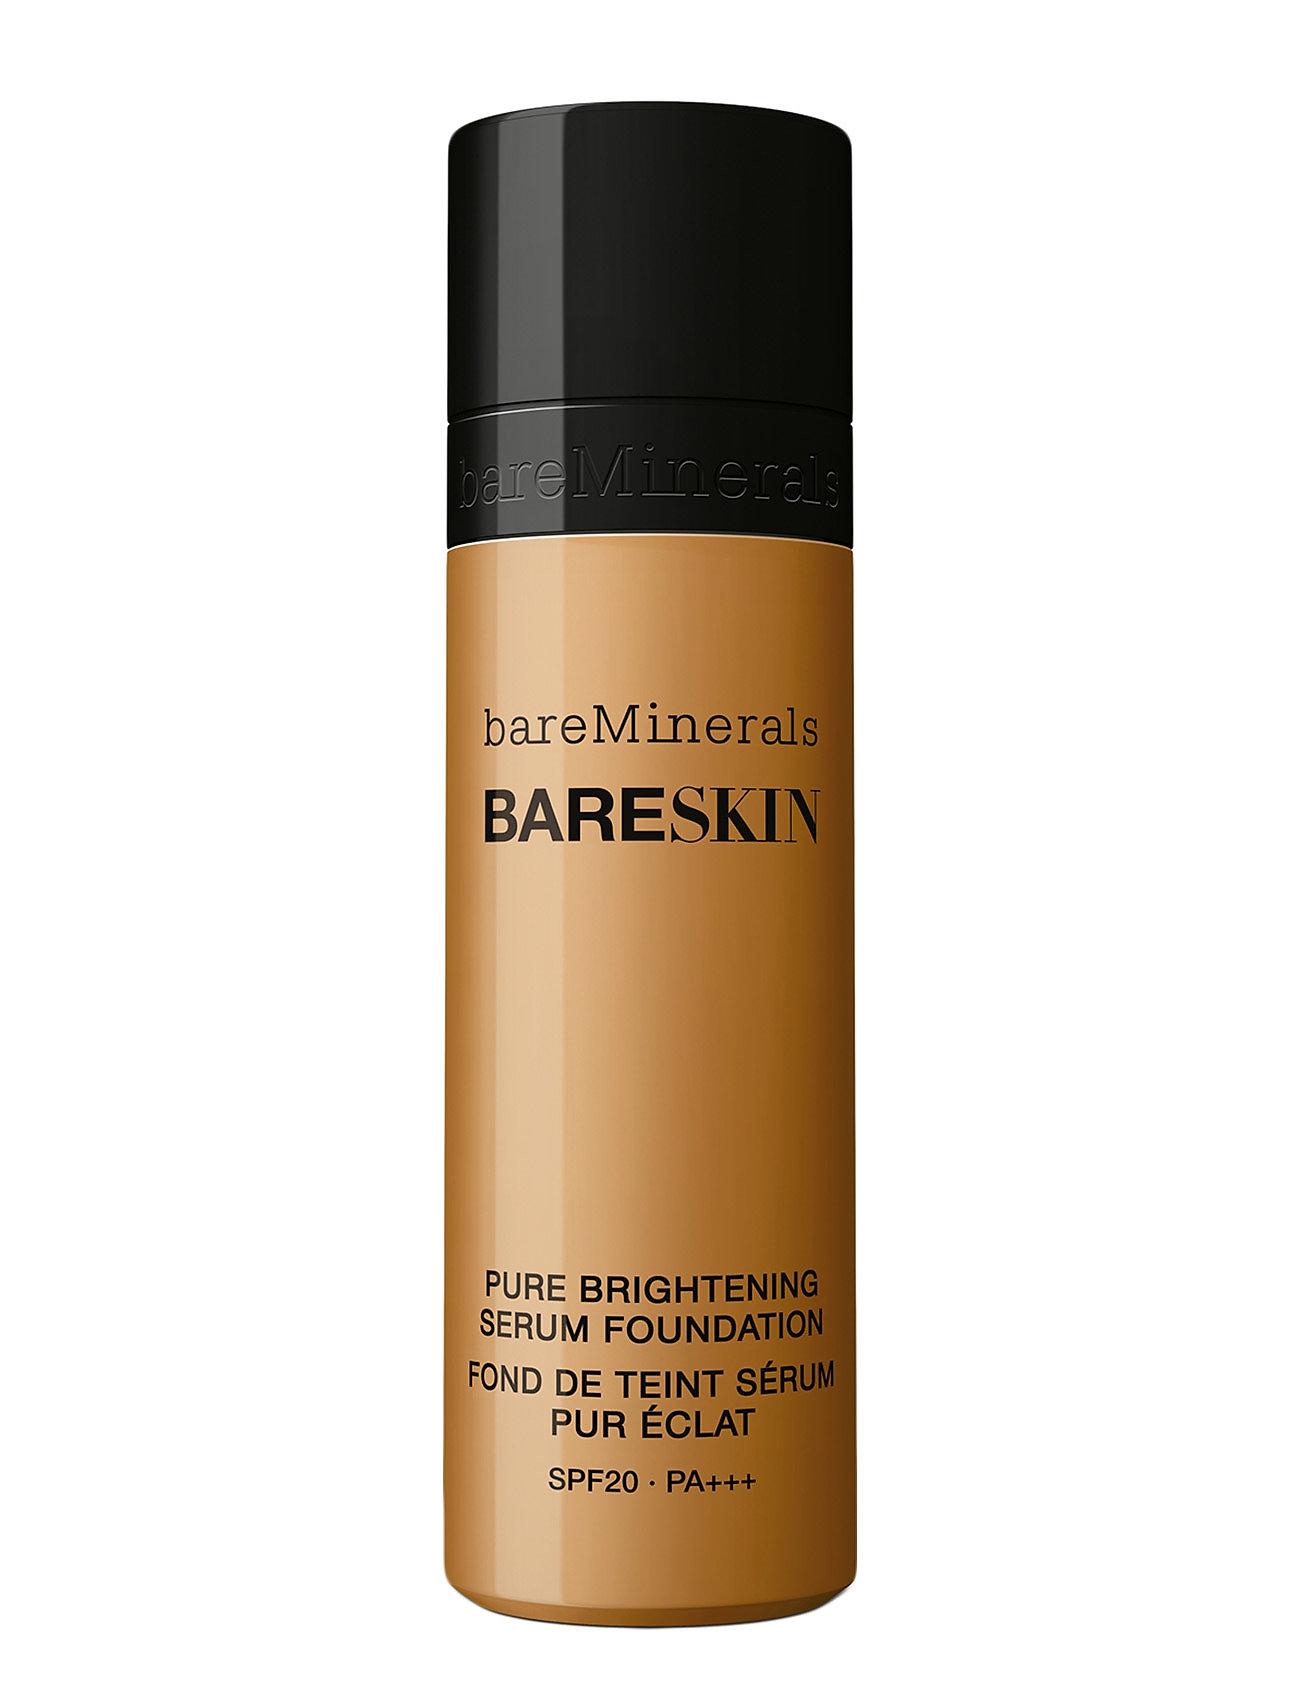 Image of Bareskin Pure Brightening Serum Foundation Spf 20 Foundation Makeup BareMinerals (3067521671)